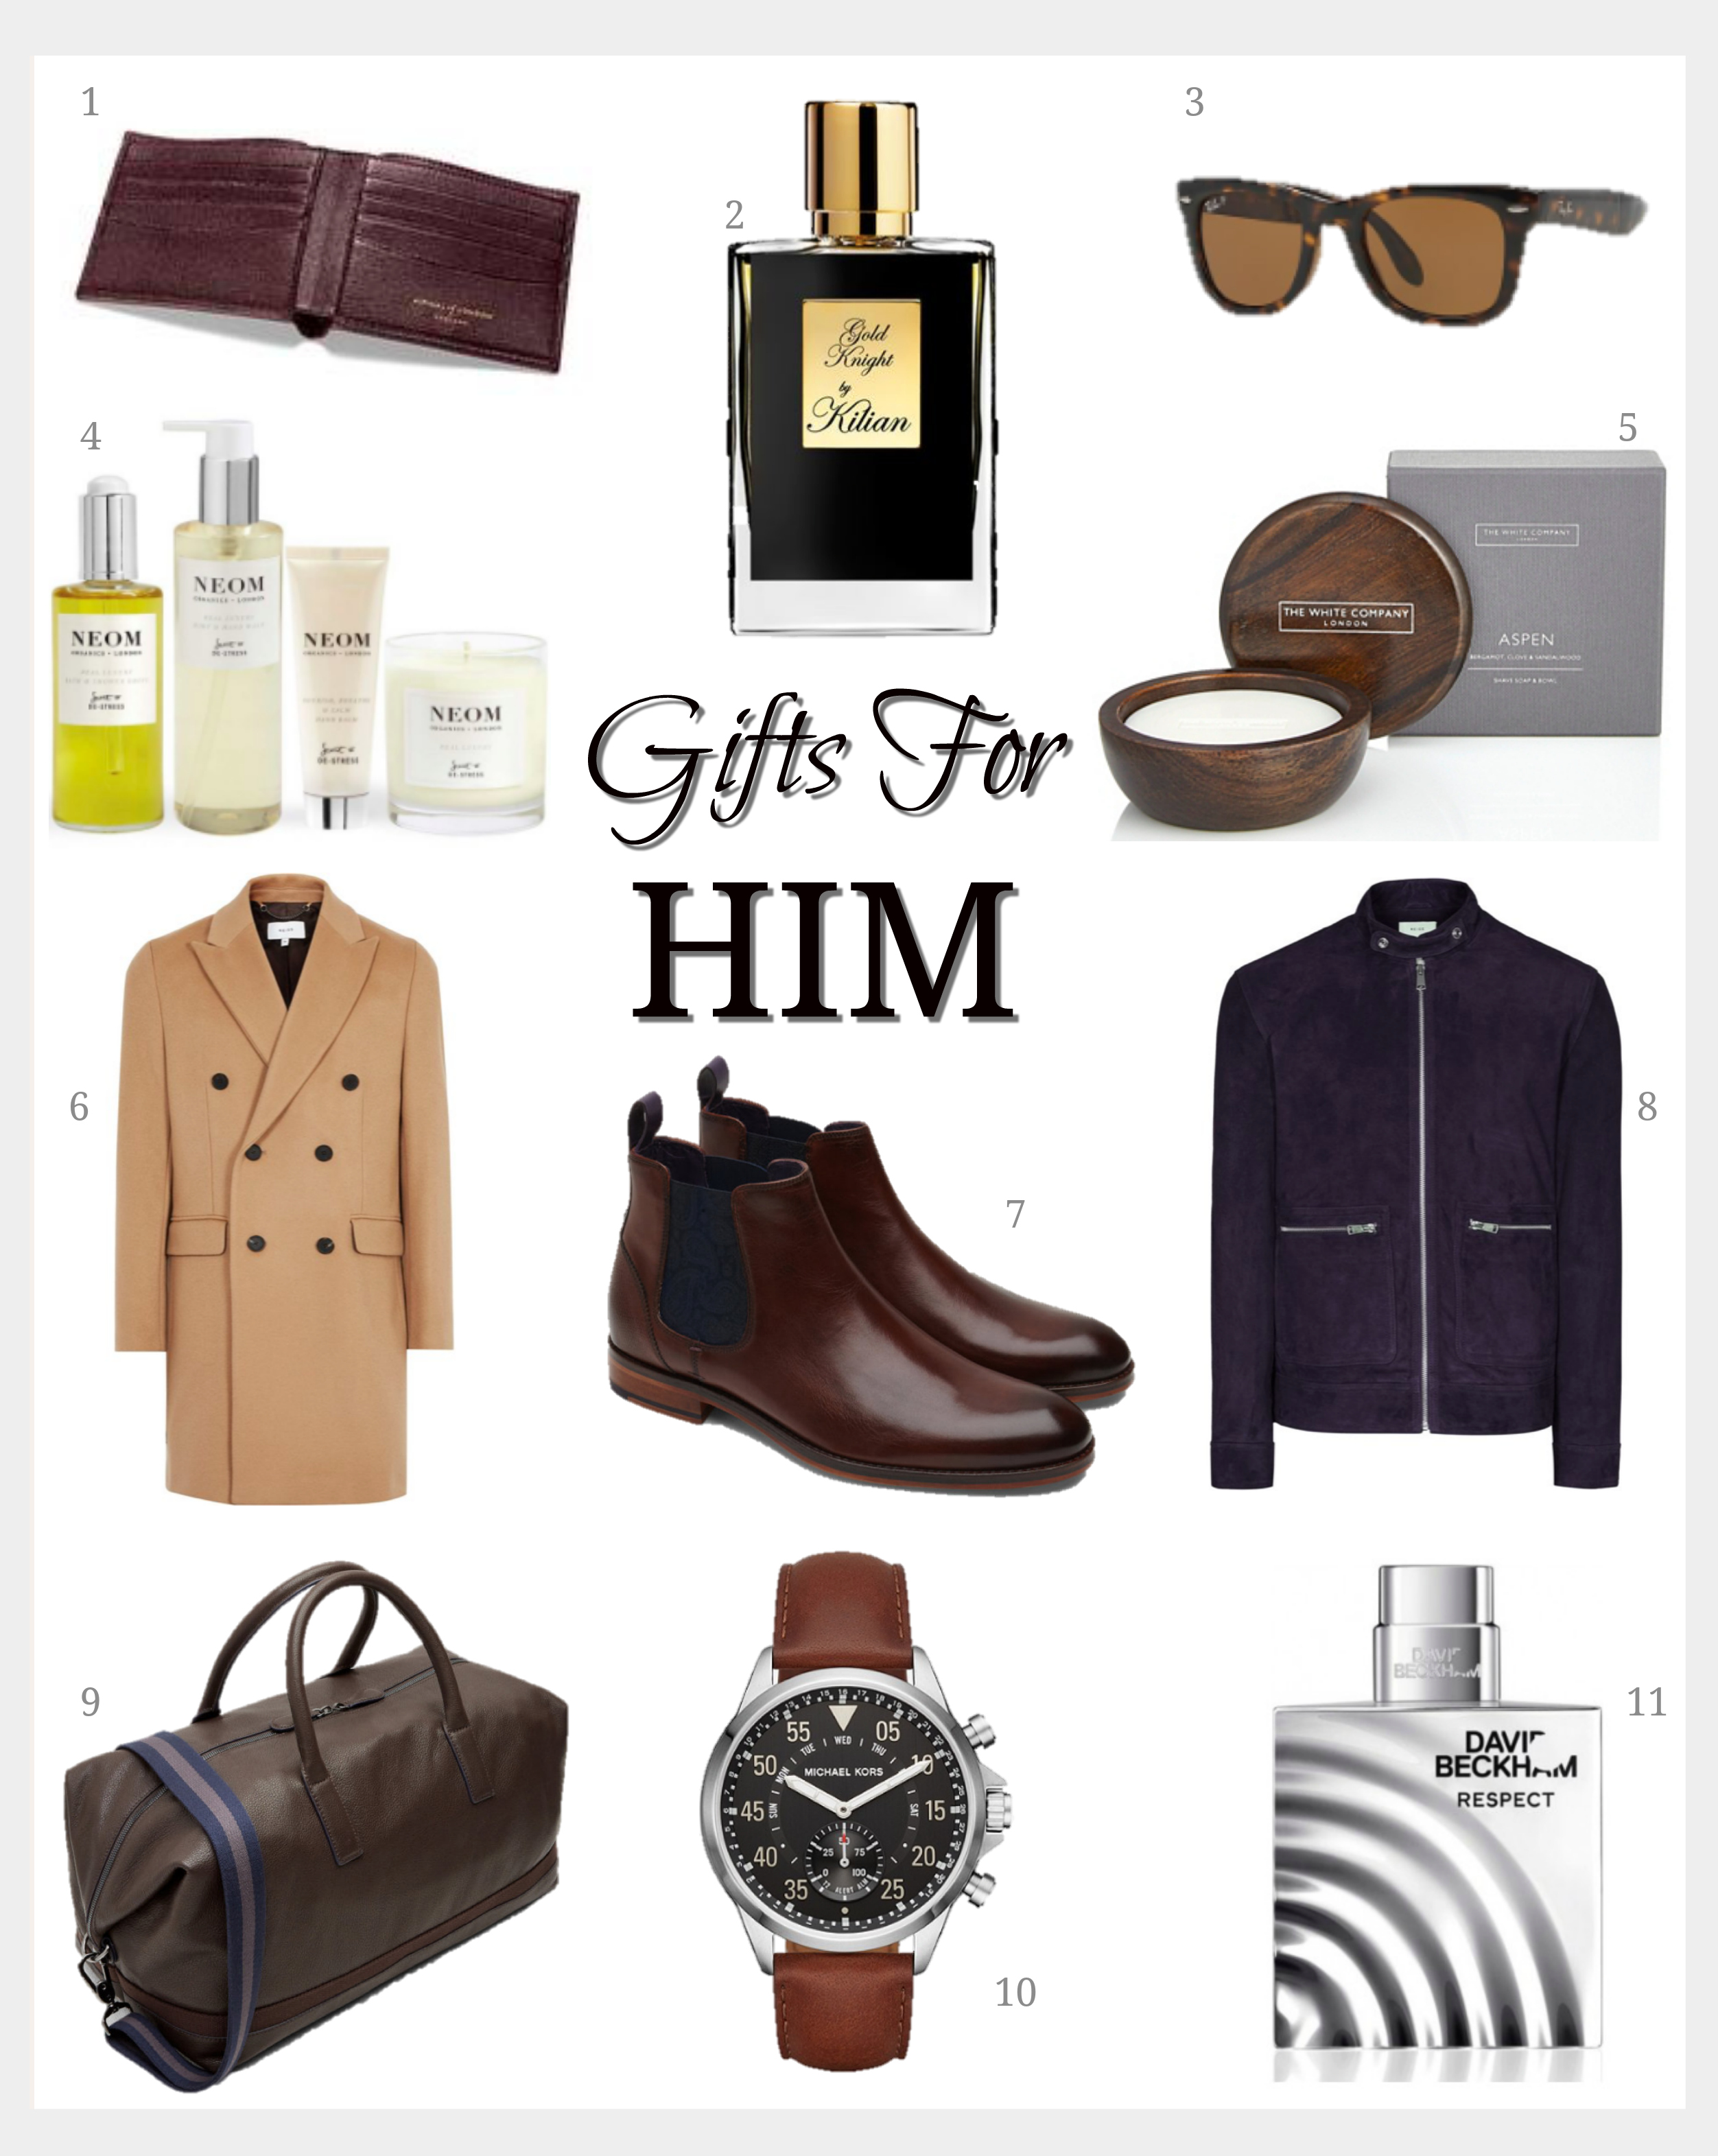 25817fb5dad79 Christmas Gift Guide for Him - Fashion Mumblr